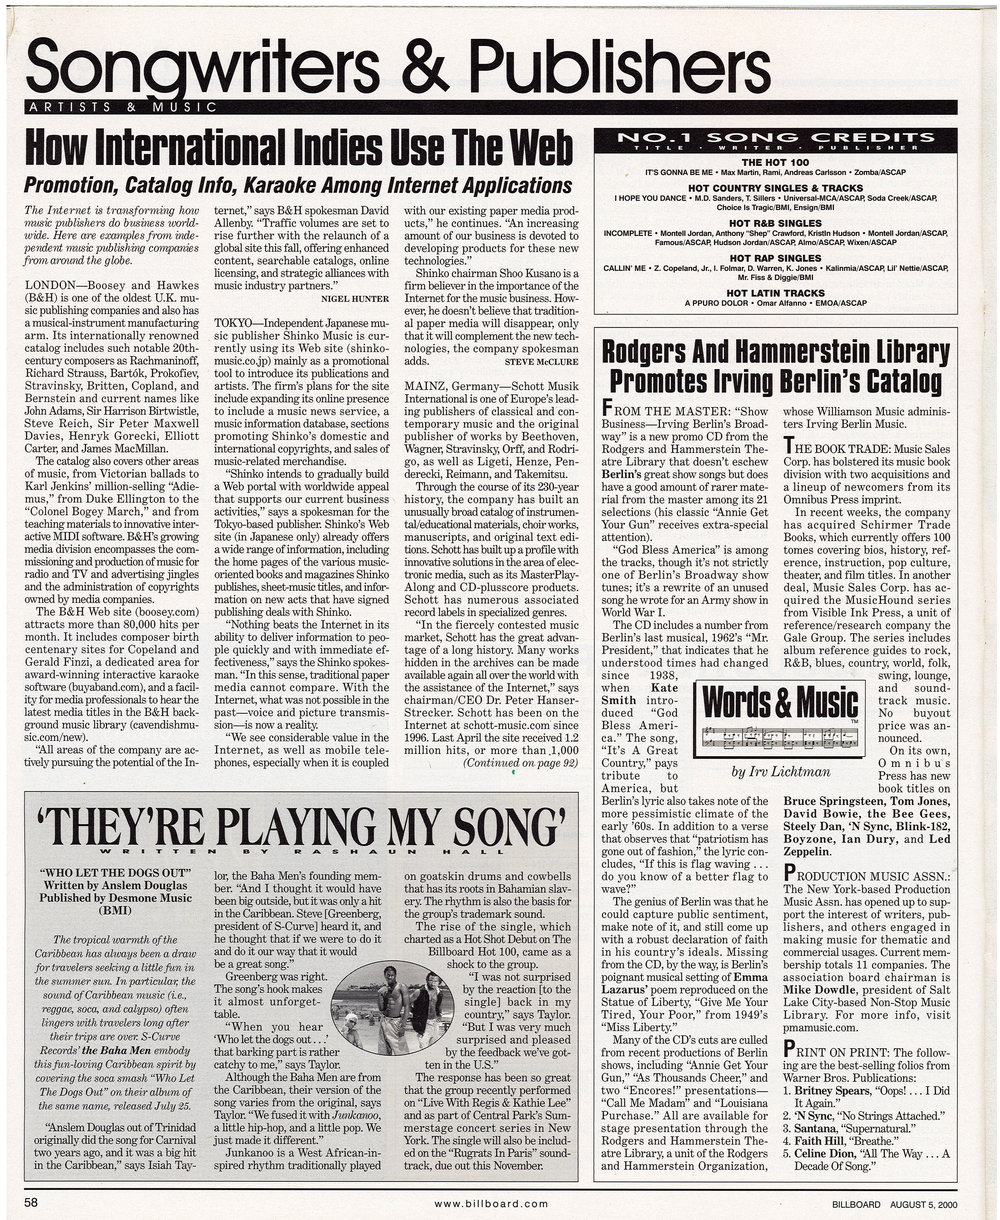 WLWLTDOO-PR-1995-BILLBOARD-08051995-P58.jpg